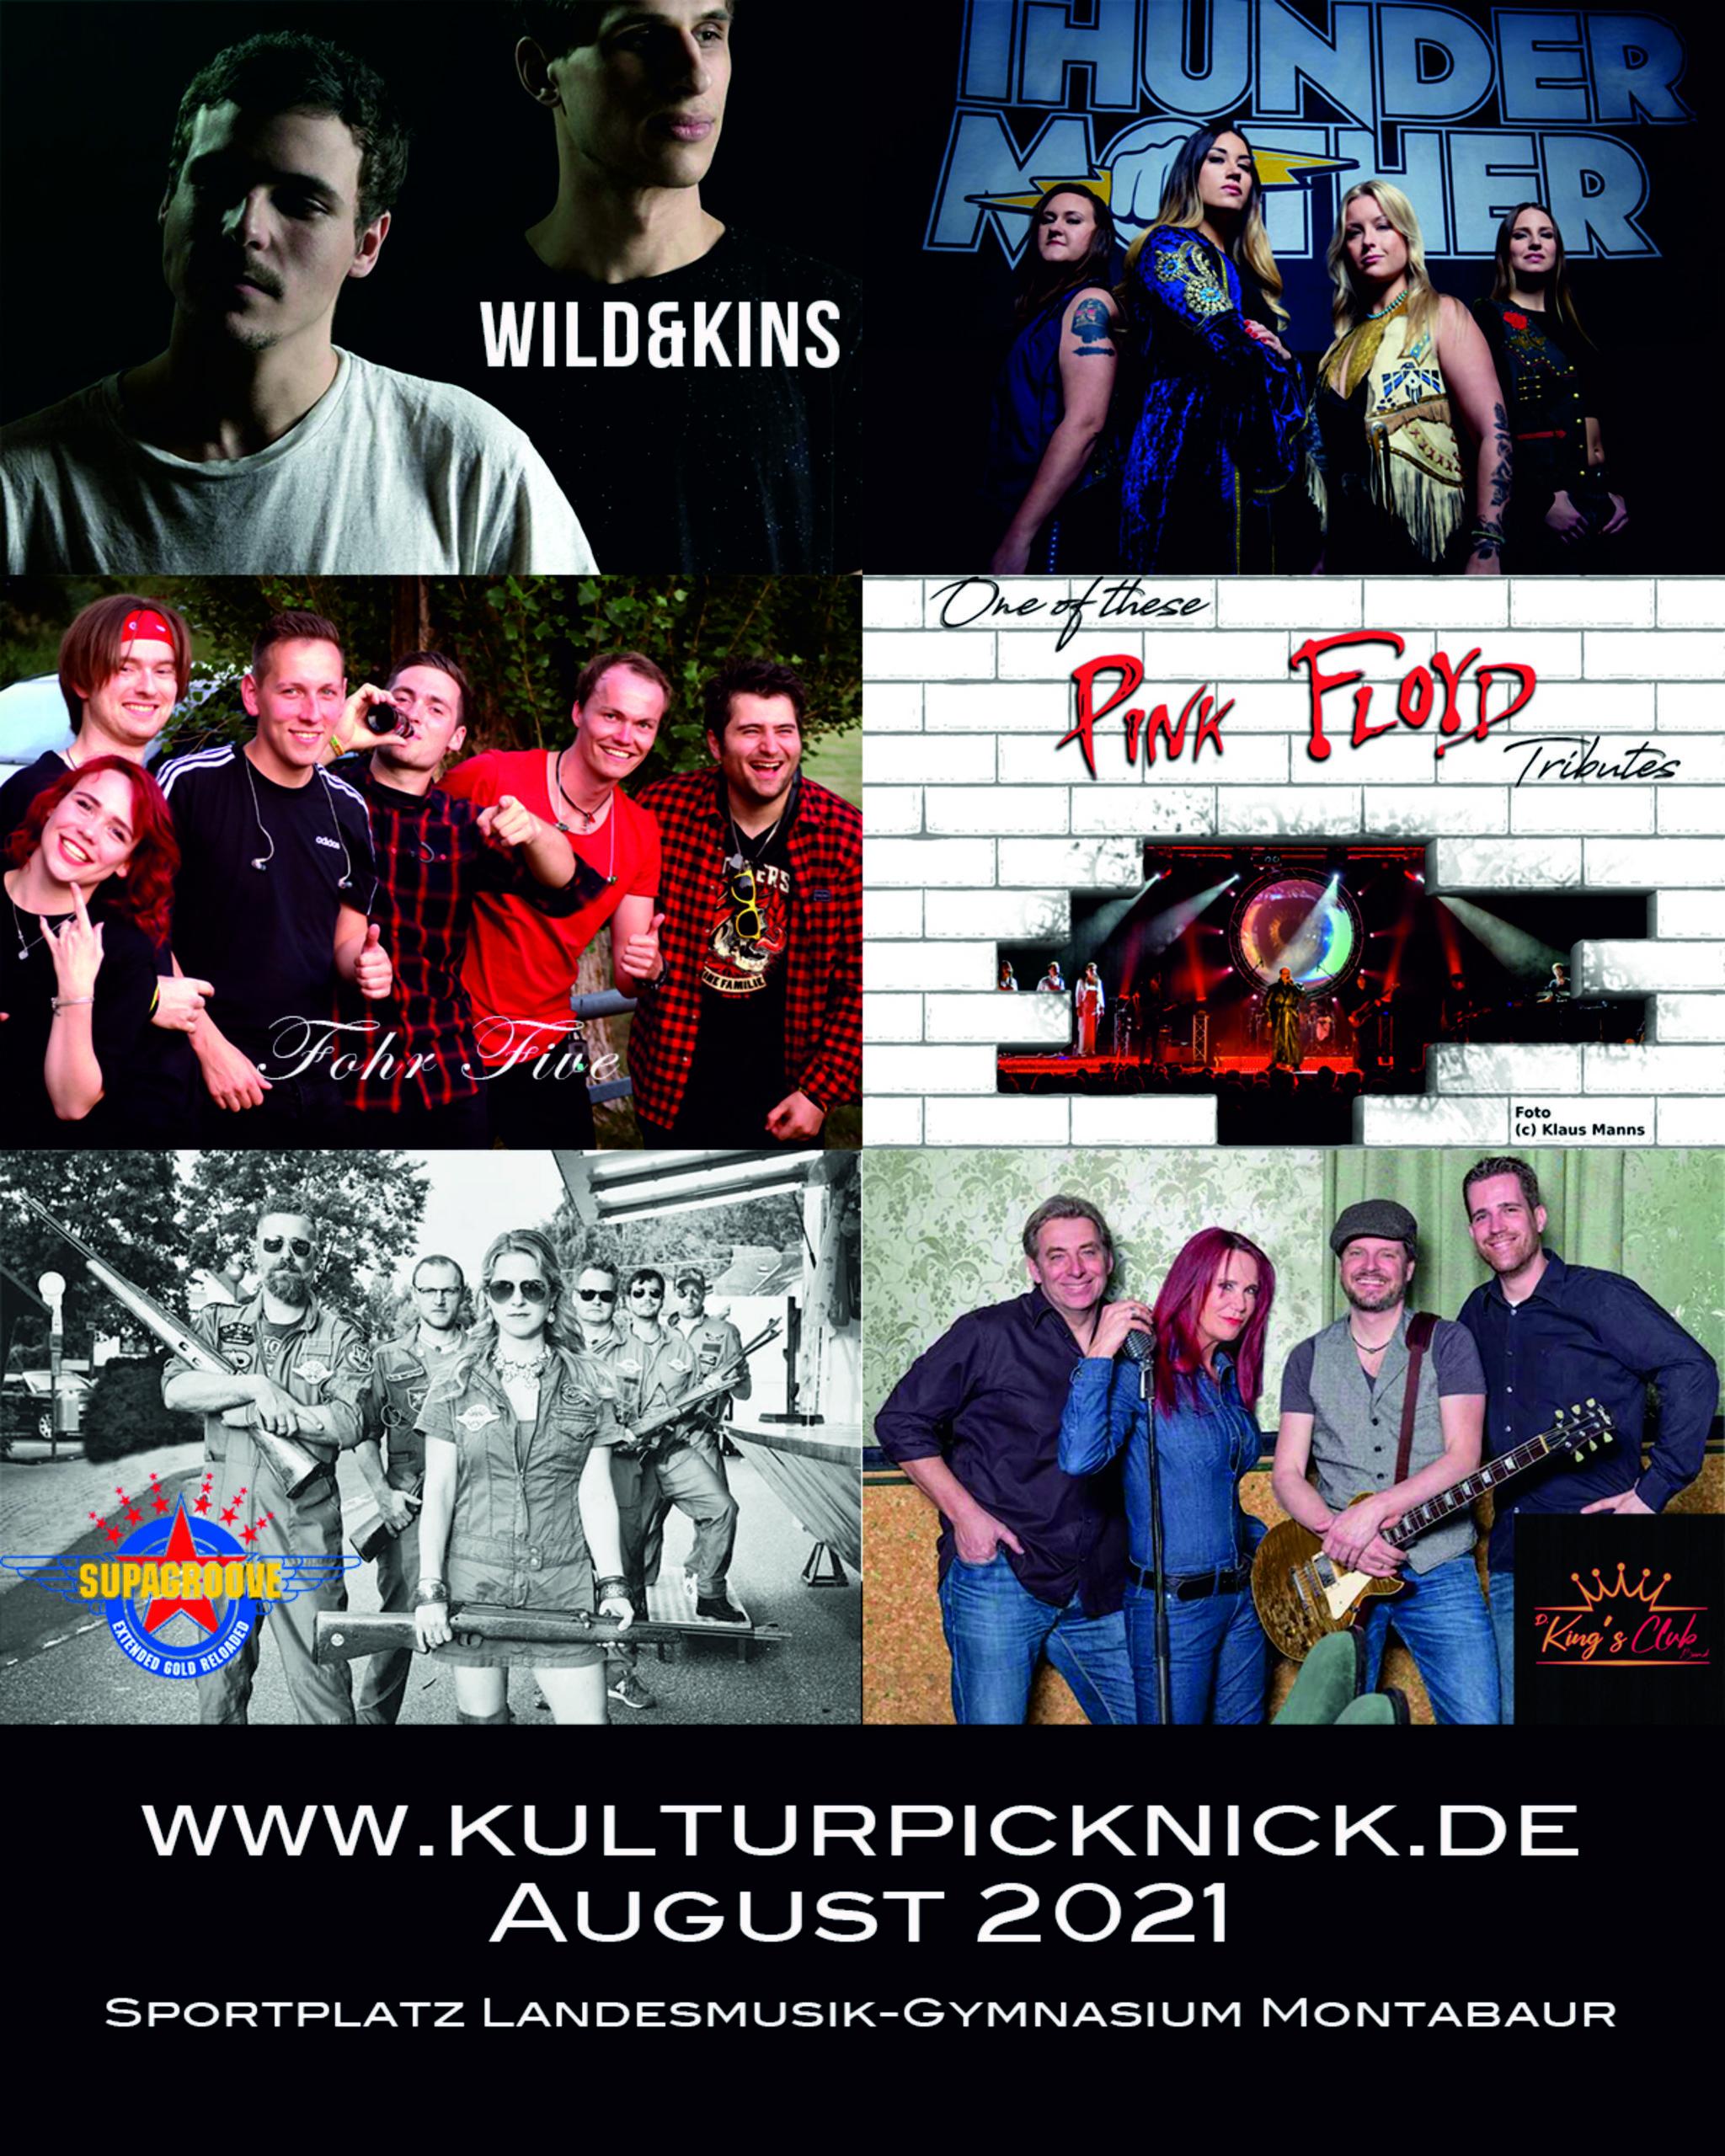 Kulturpicknick Montabaur am Sportplatz Landesmusikgymnasium